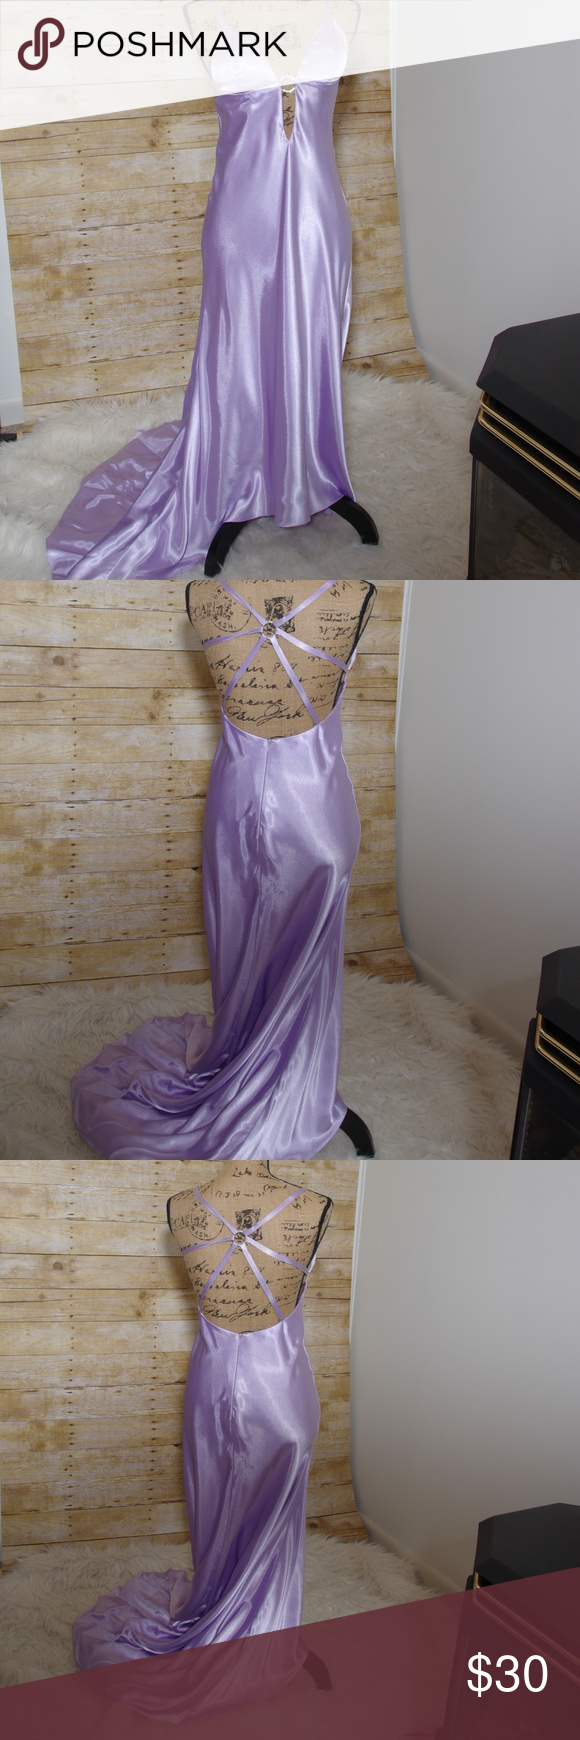 Faviana new york lavender prom dress my posh closet